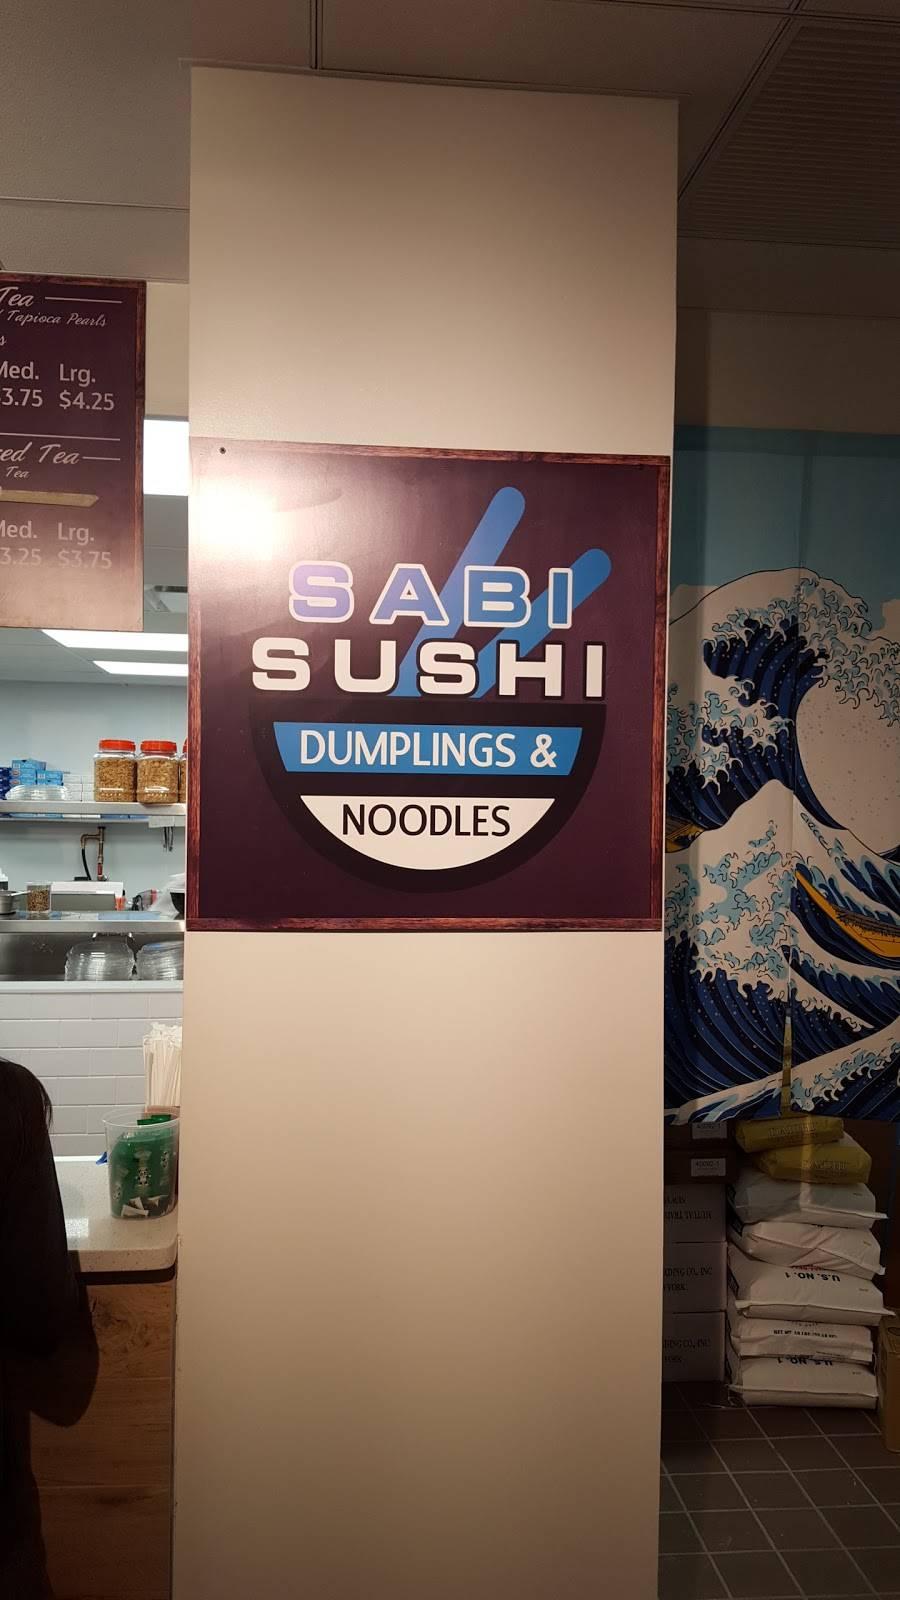 Sabi Sushi   restaurant   1 New York Plaza, 1 FDR Dr., New York, NY 10004, USA   6468632374 OR +1 646-863-2374